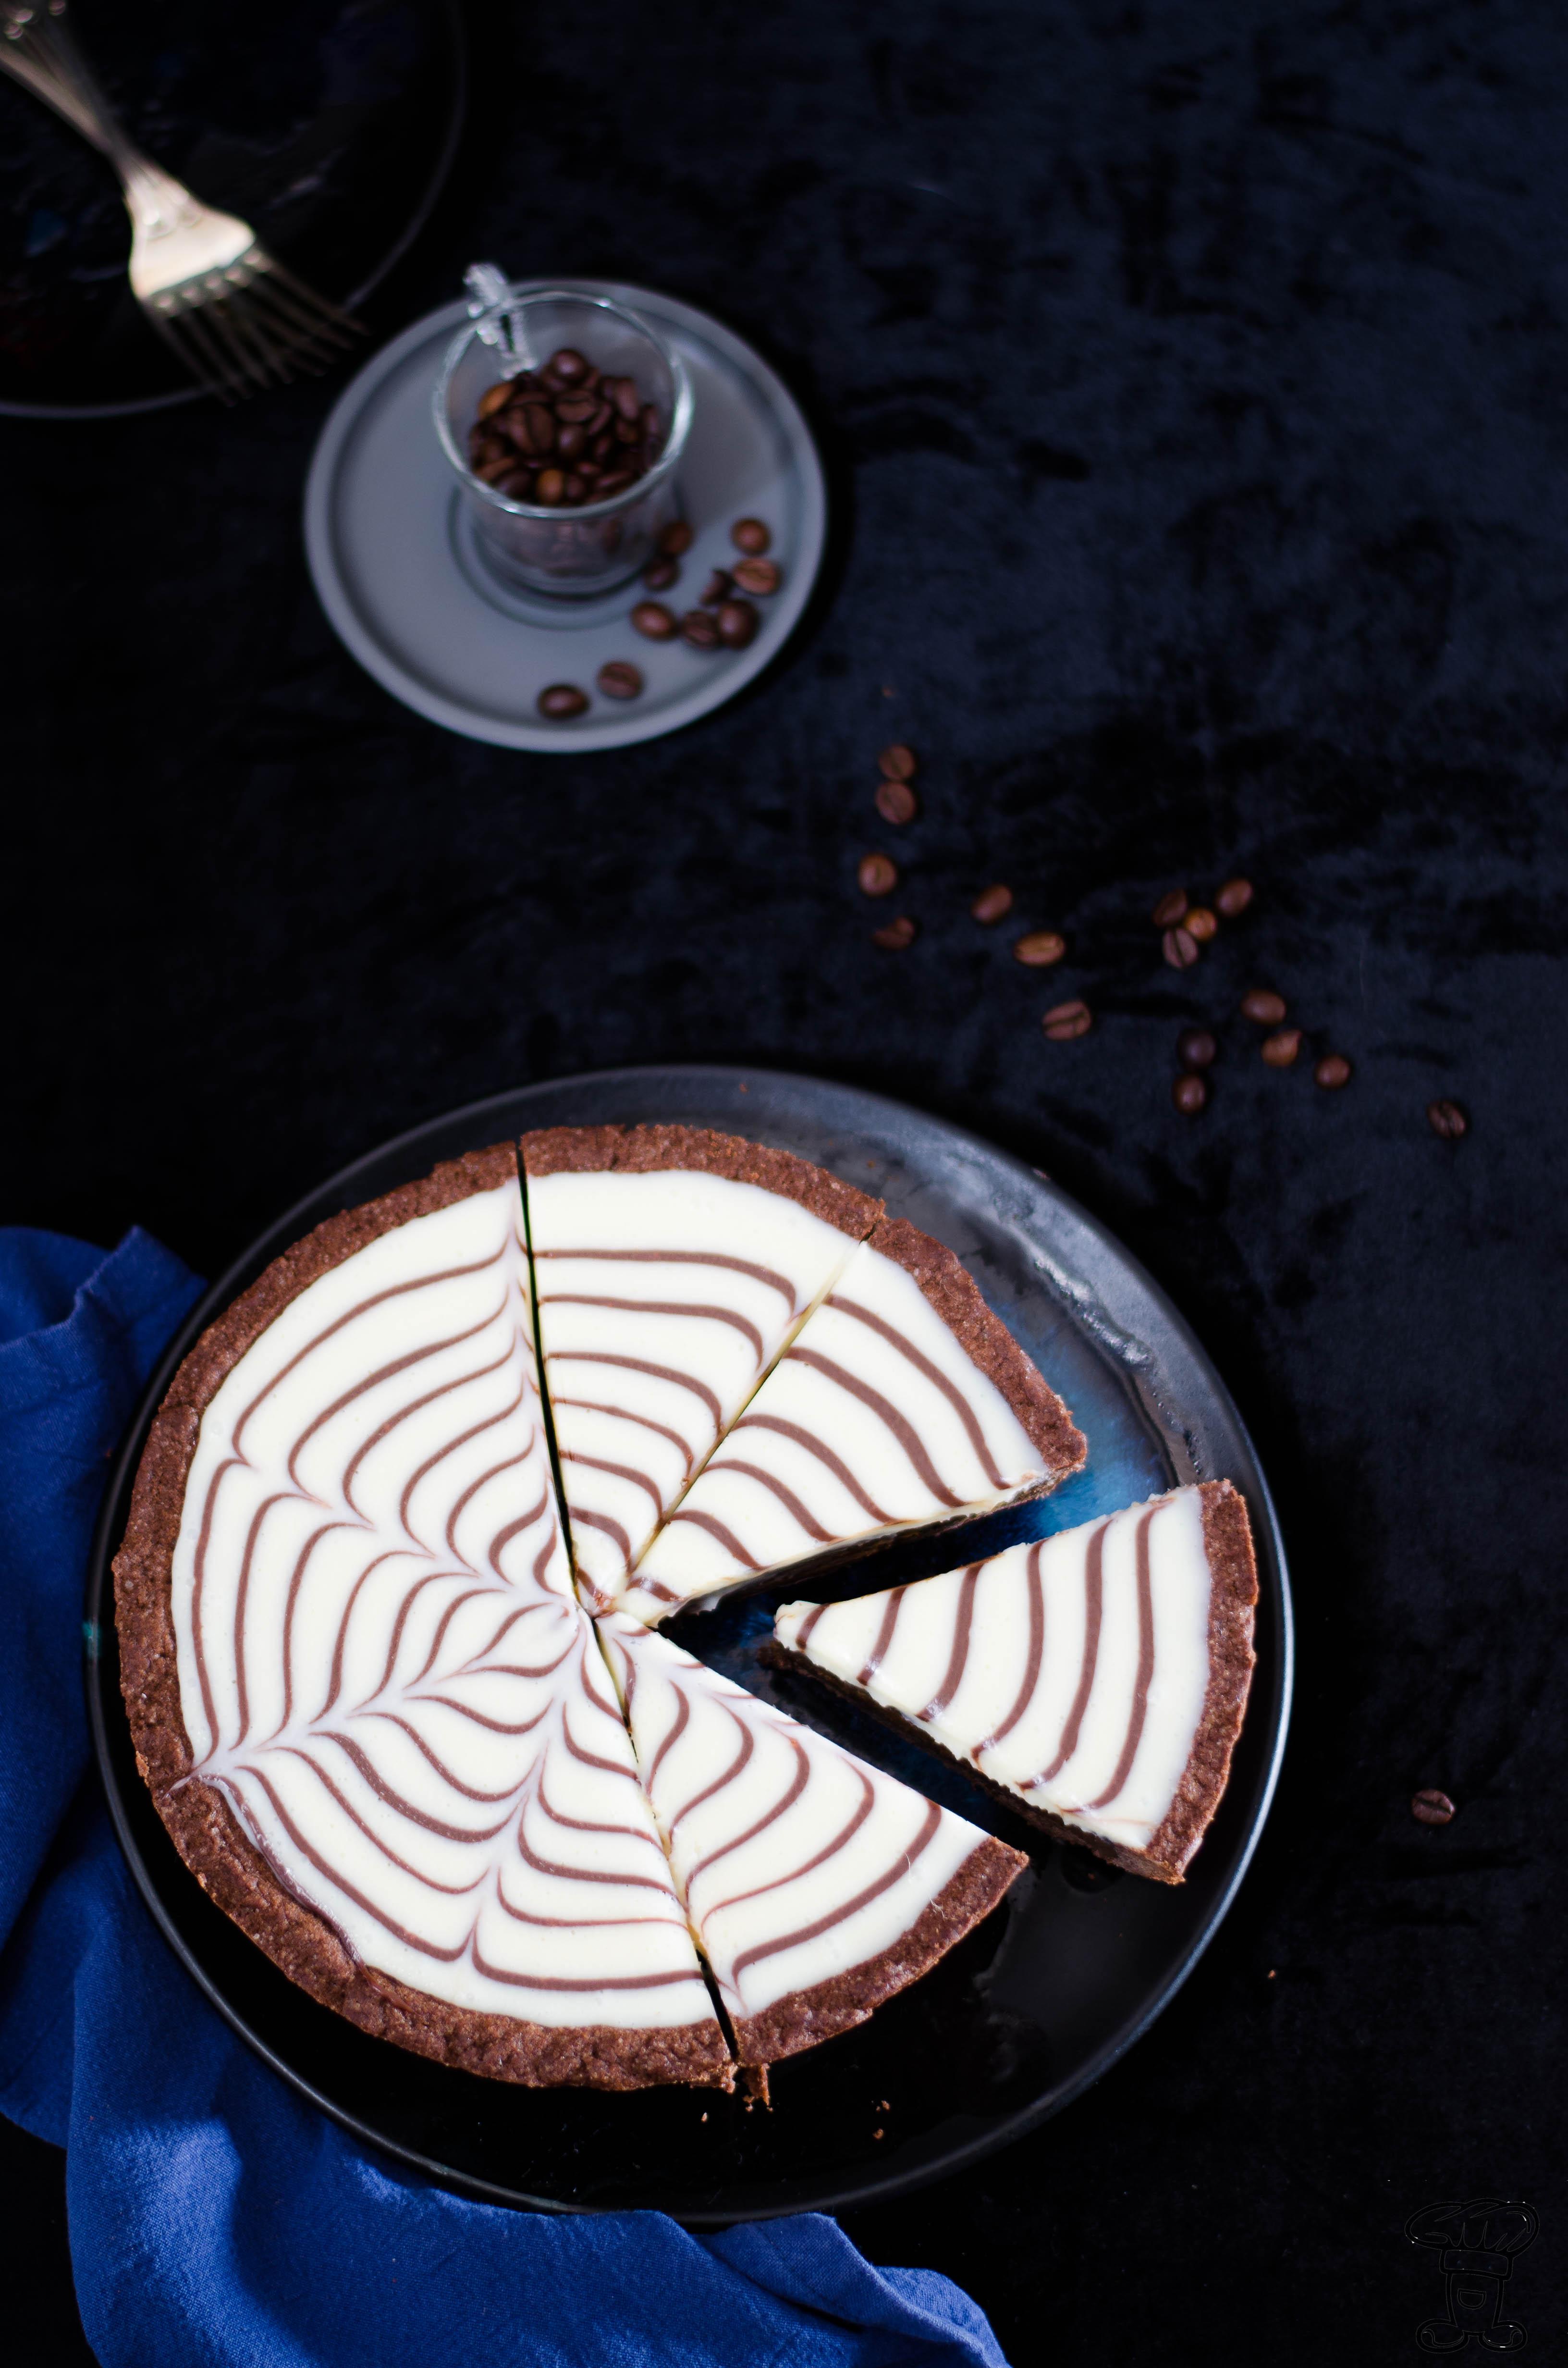 torta_mocaccino_knam3 Torta mocaccino di Knam